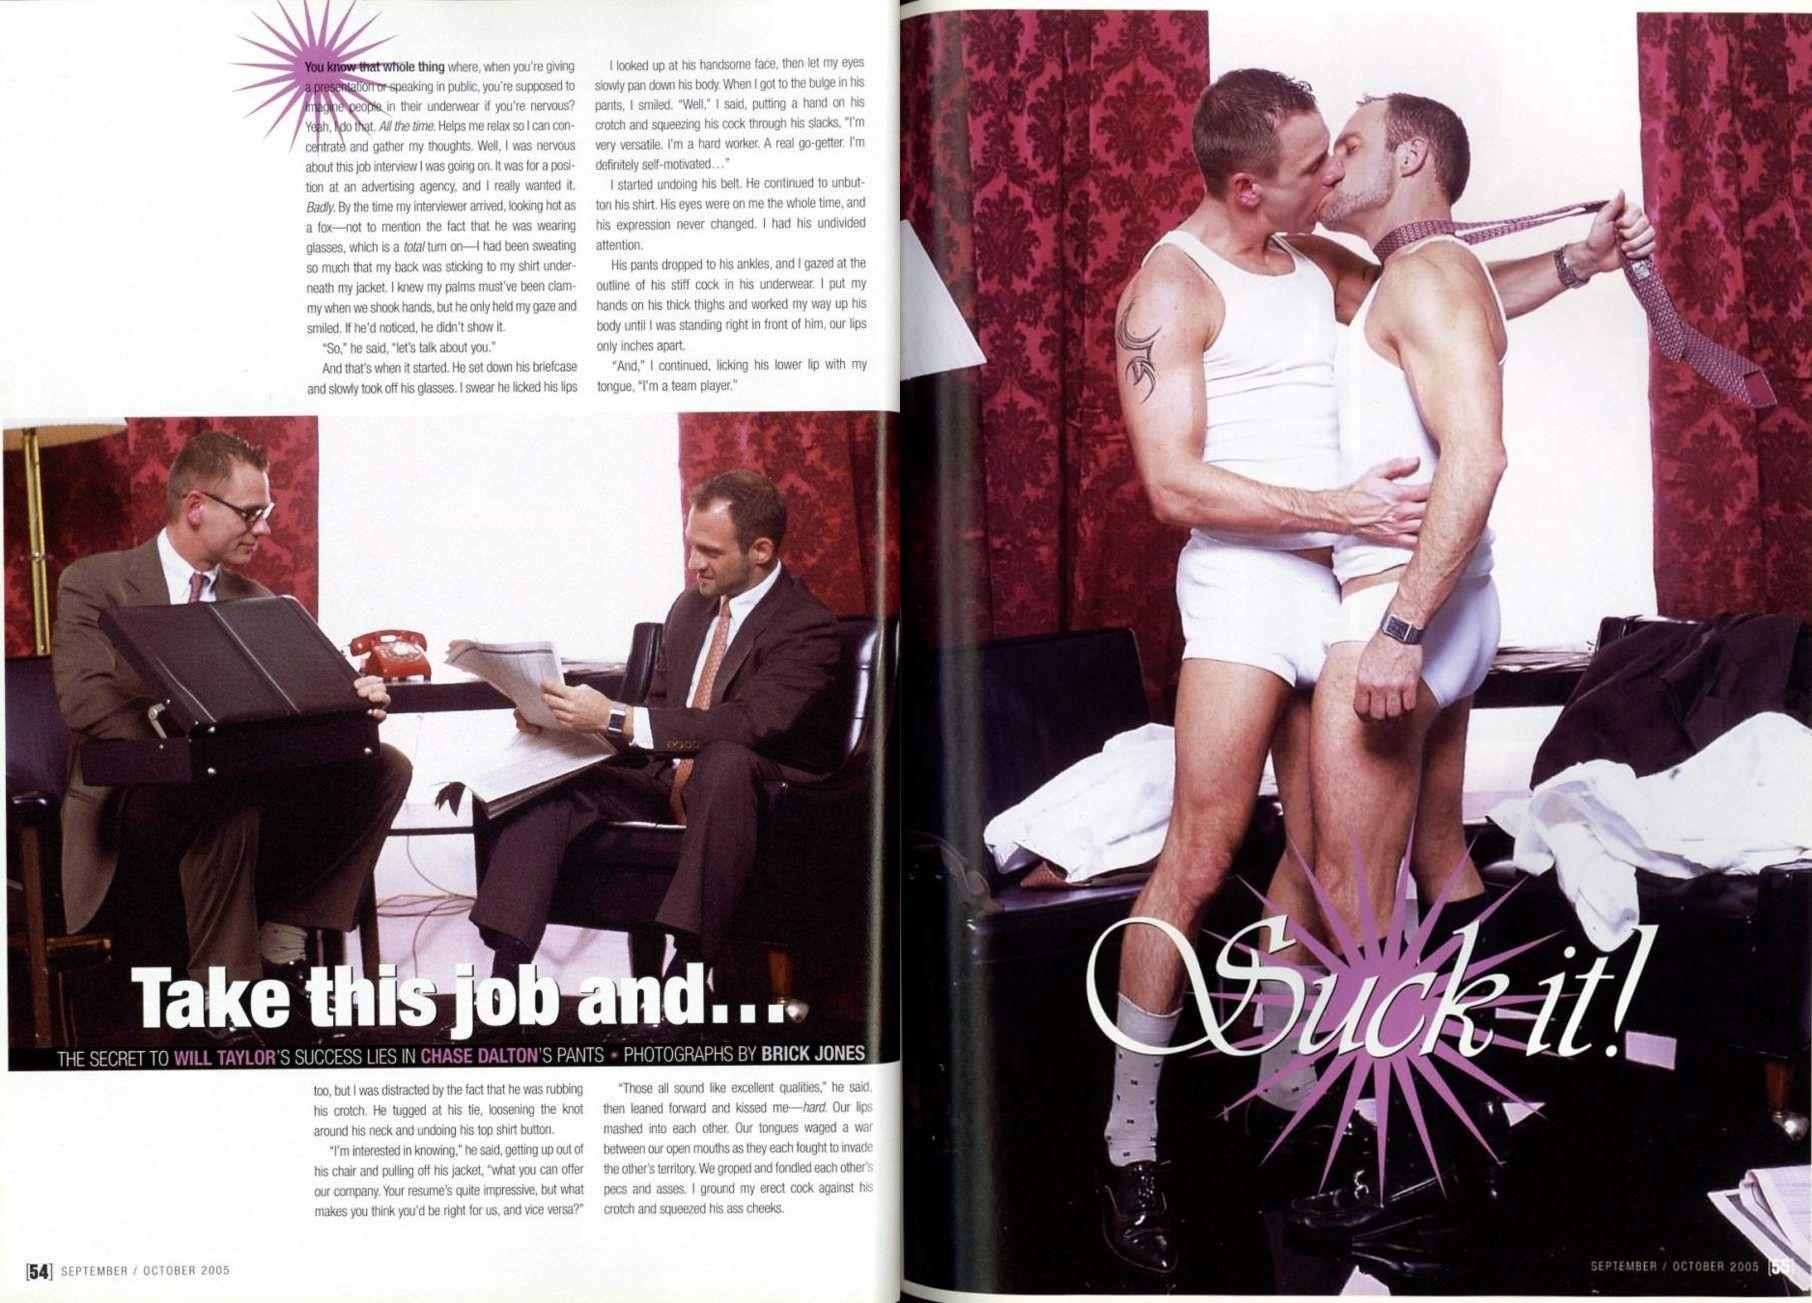 Chase Dalton Will Taylor gay hot daddy dude men porn 2Mag